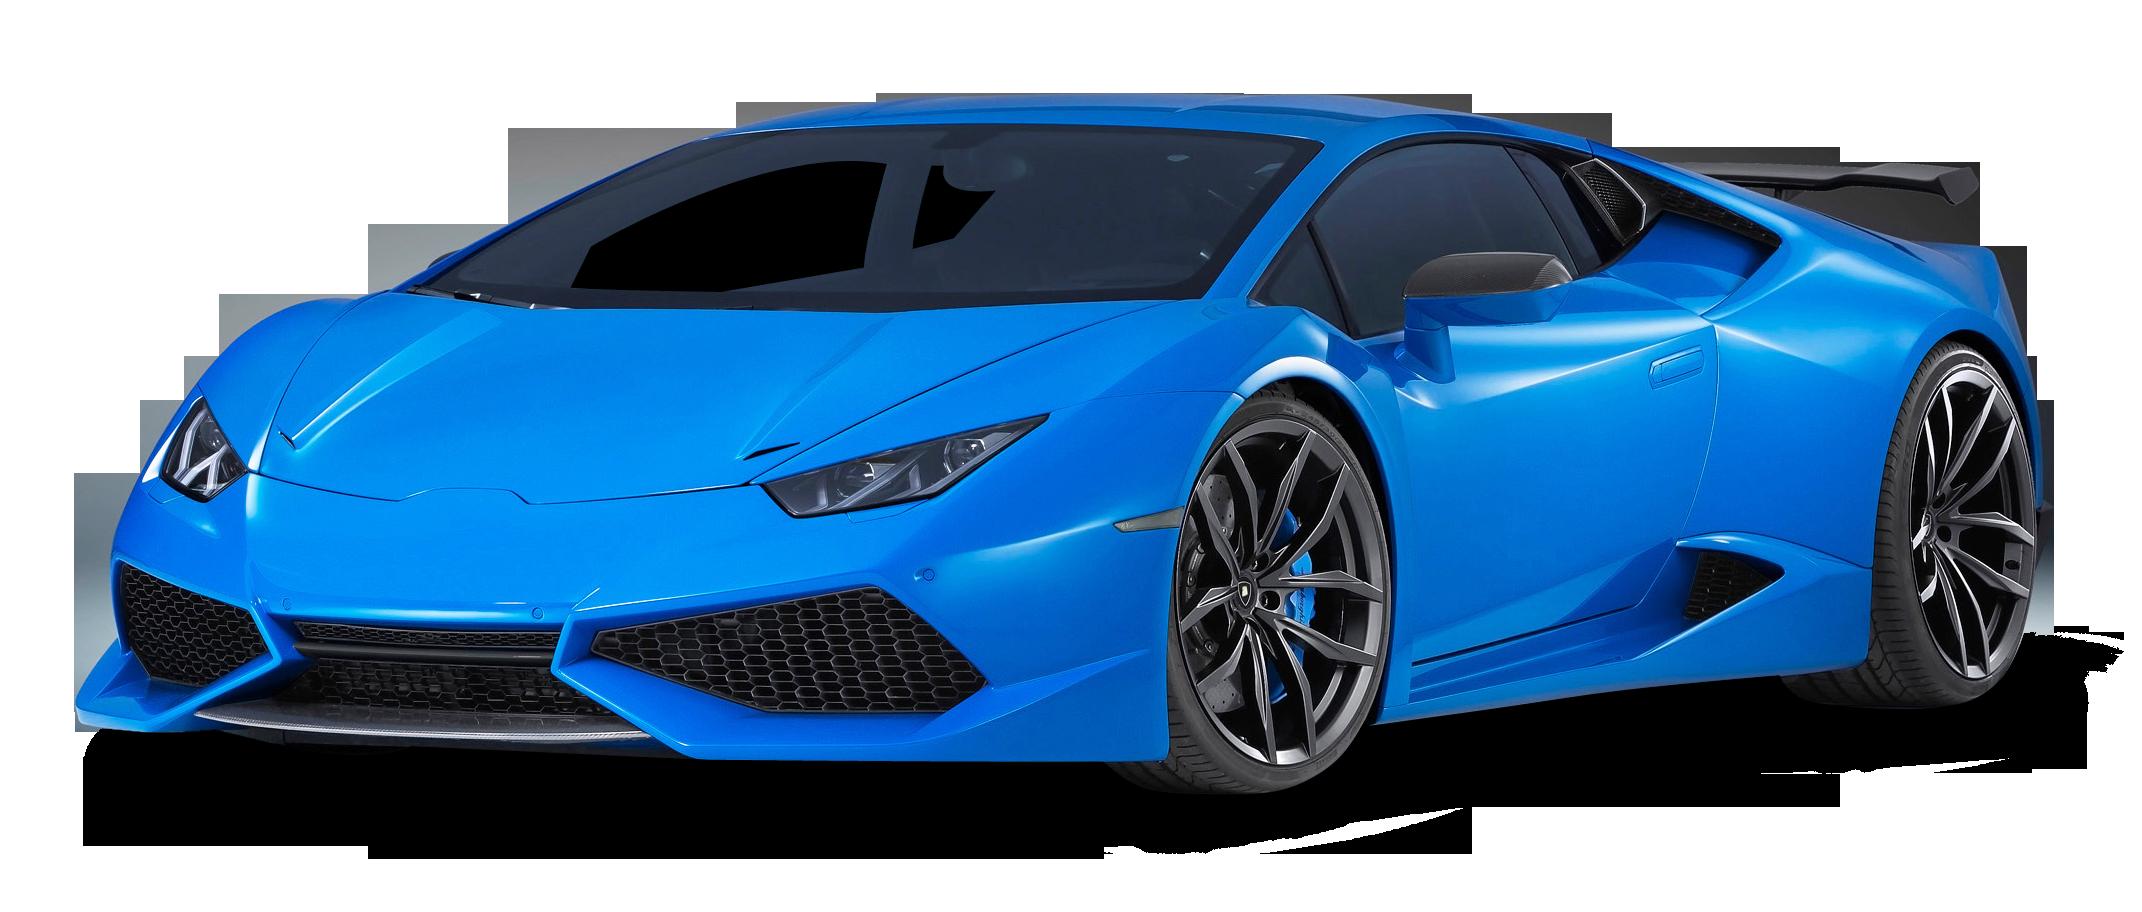 Lamborghini Huracan Car Png Image Purepng Free Transparent Cc0